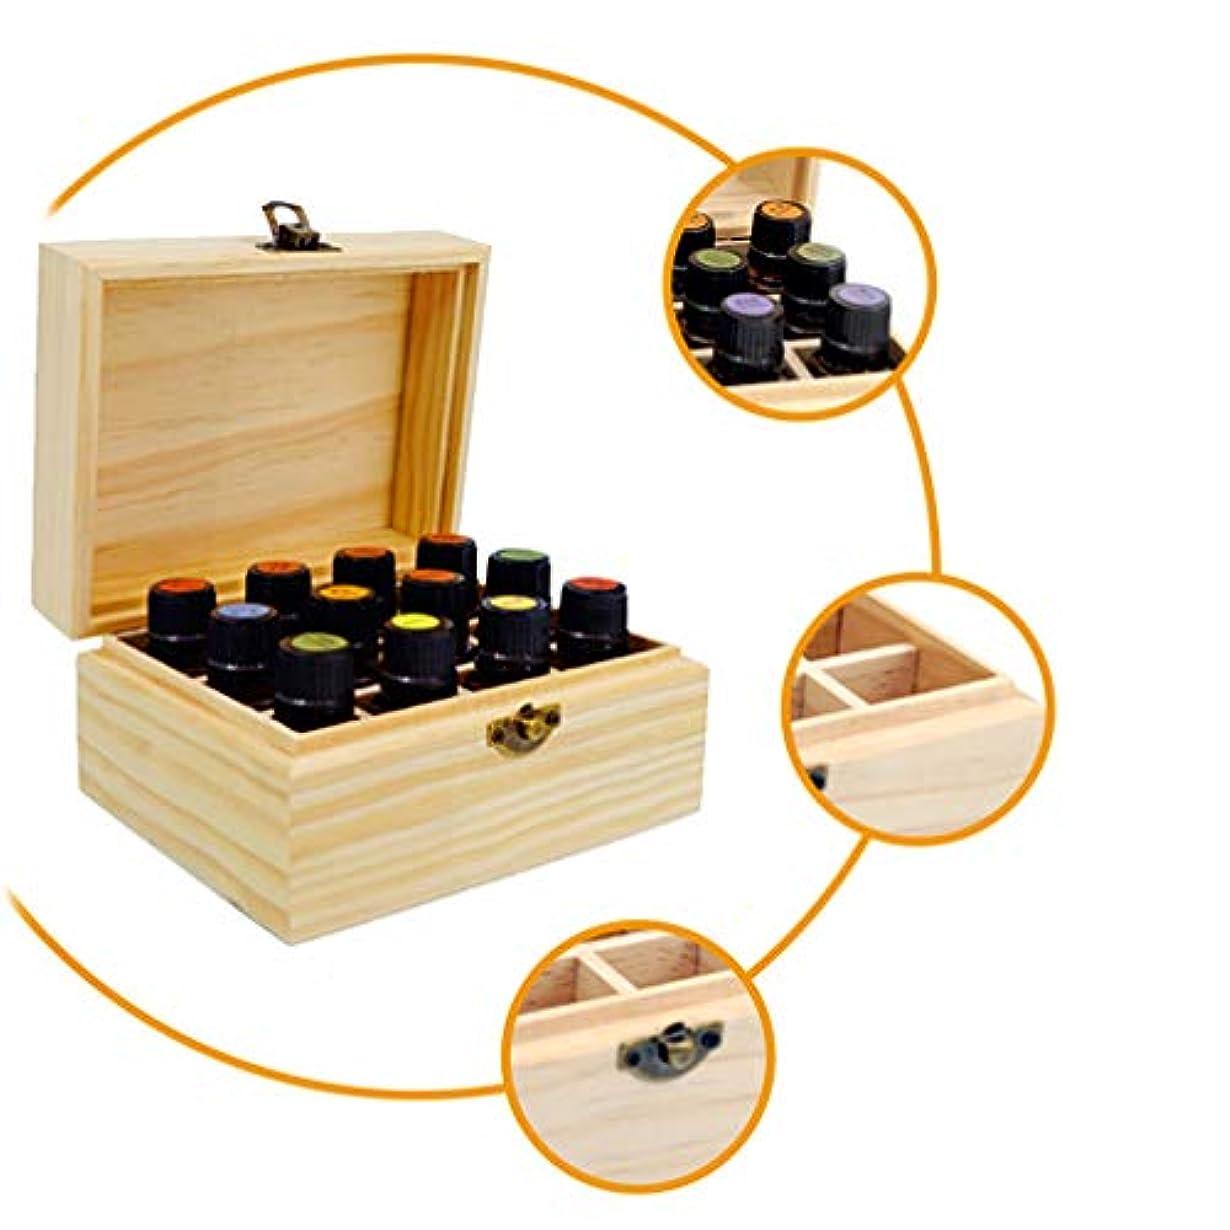 JIOLK エッセンシャルオイル 収納ボックス 12本用 木製 香水収納ケース 大容量 精油収納 携帯便利 オイルボックス おしゃれ 精油ケース